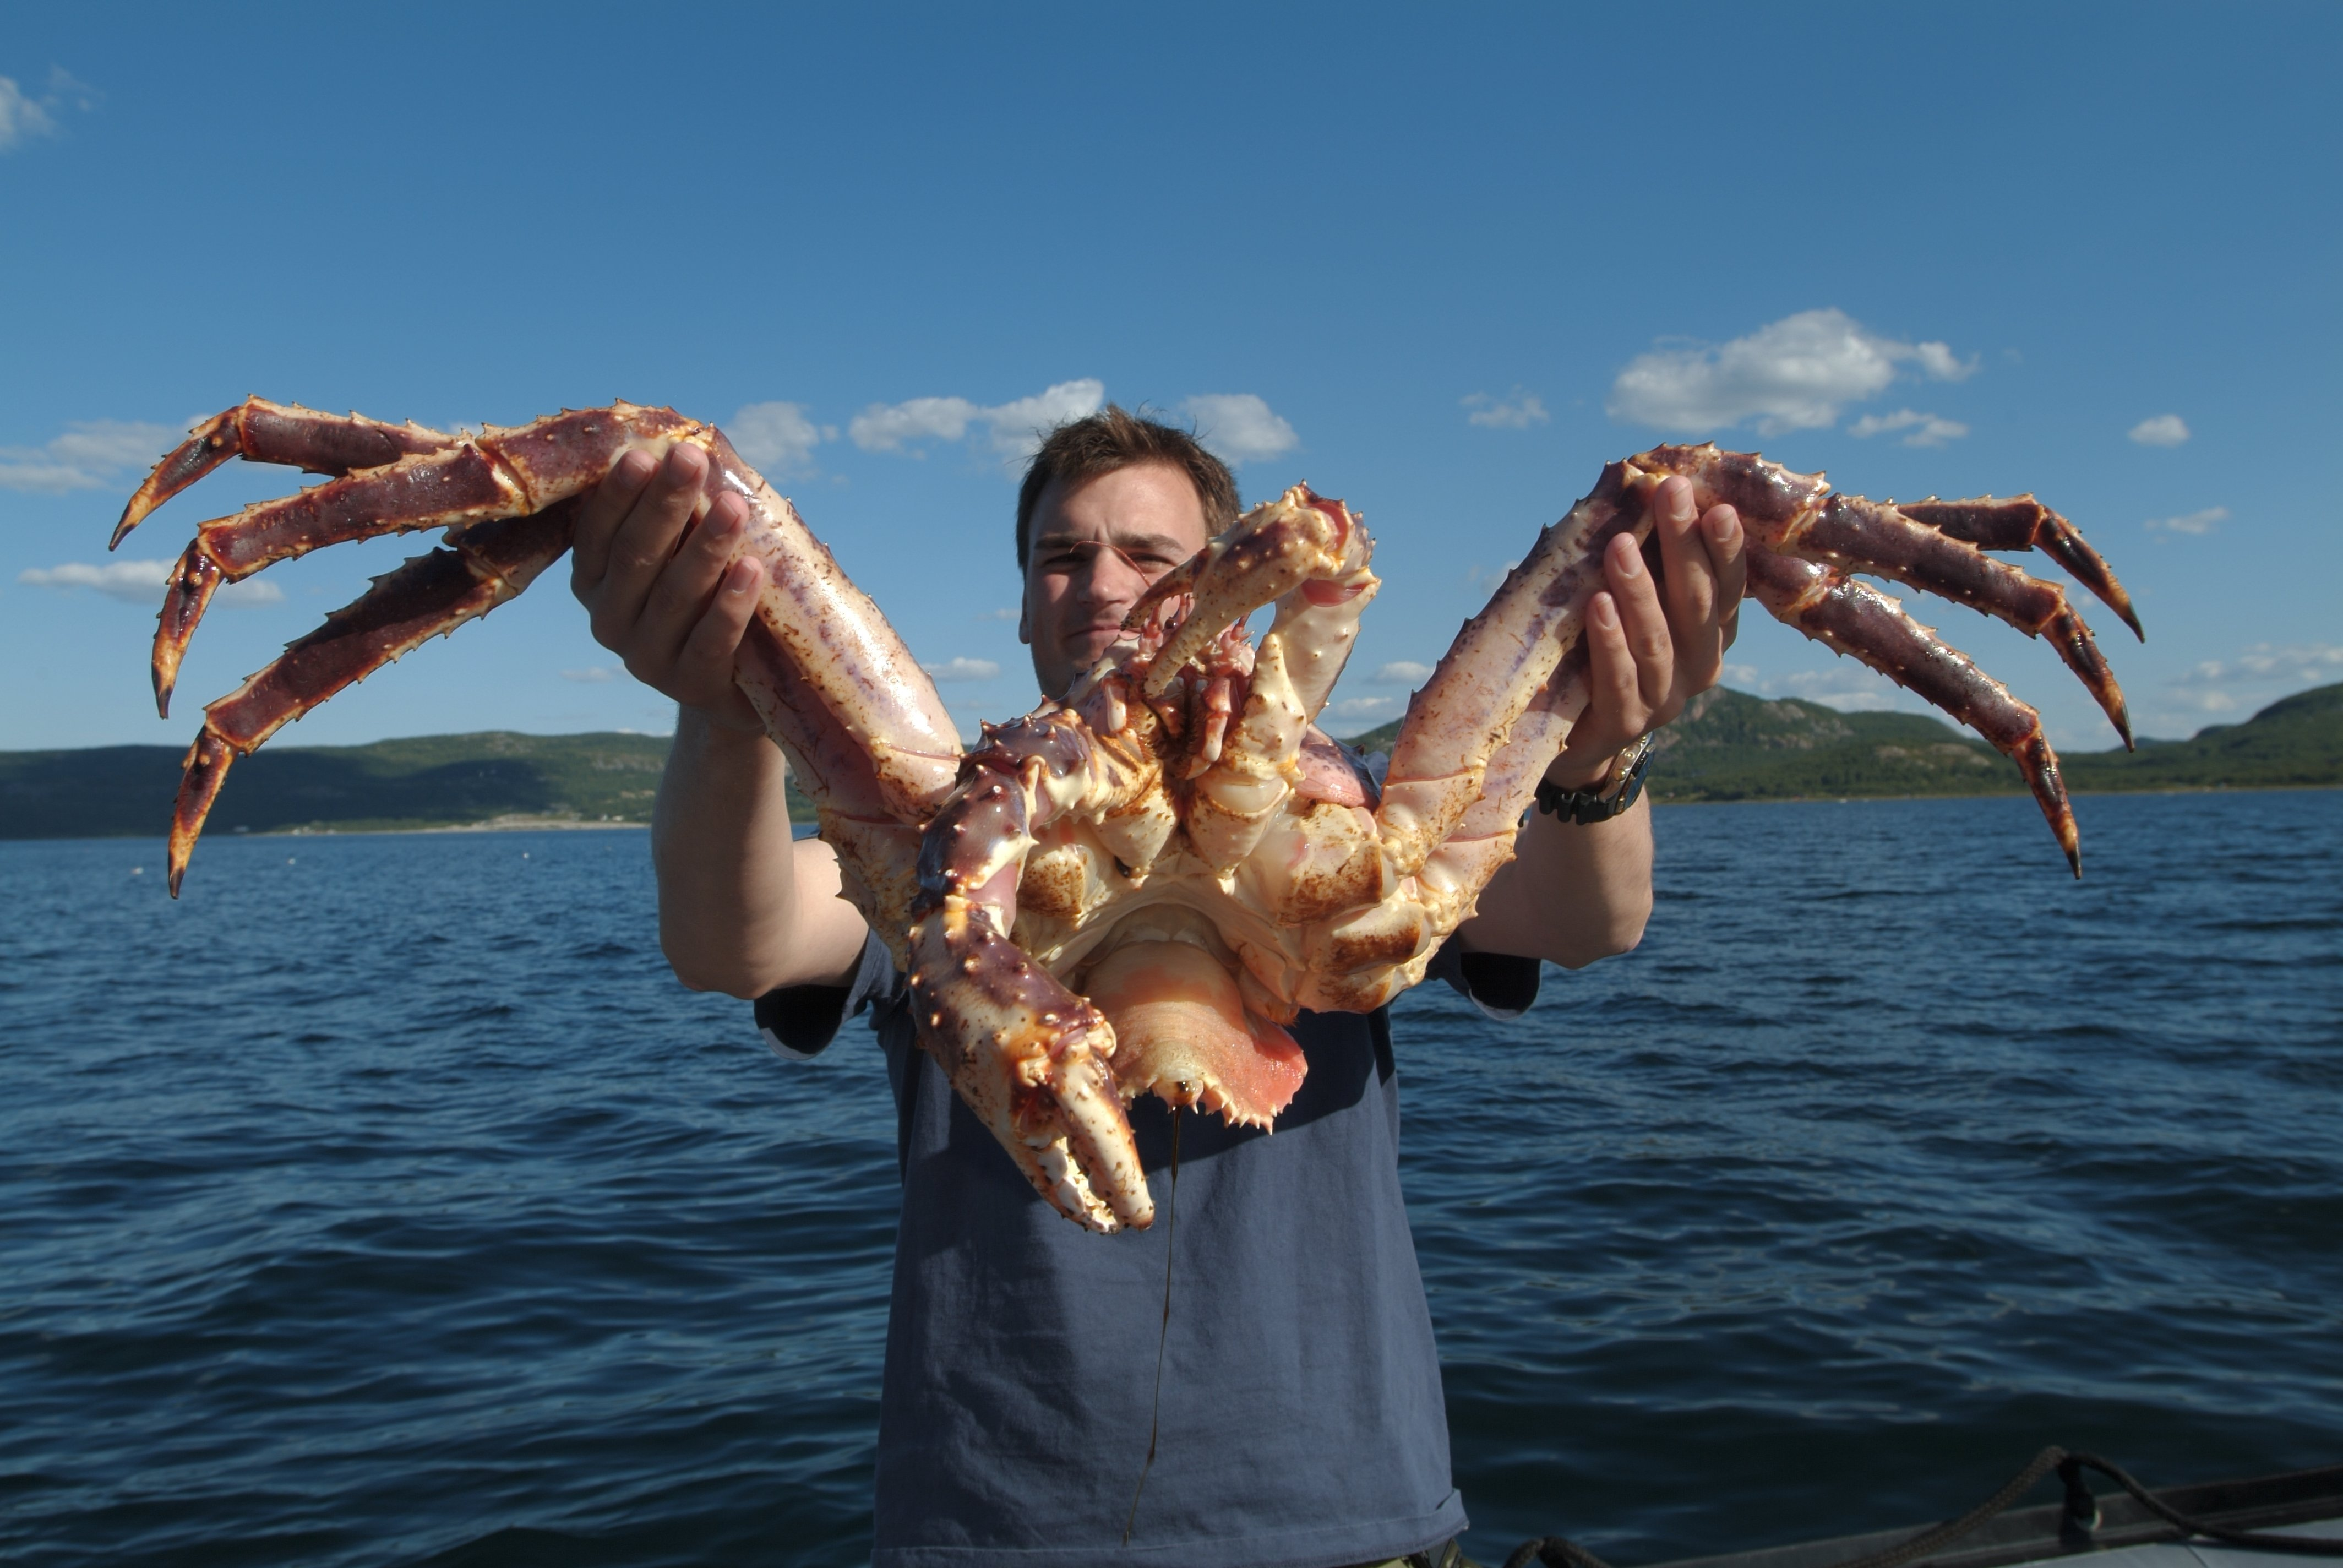 King Crabs - tasty monsters